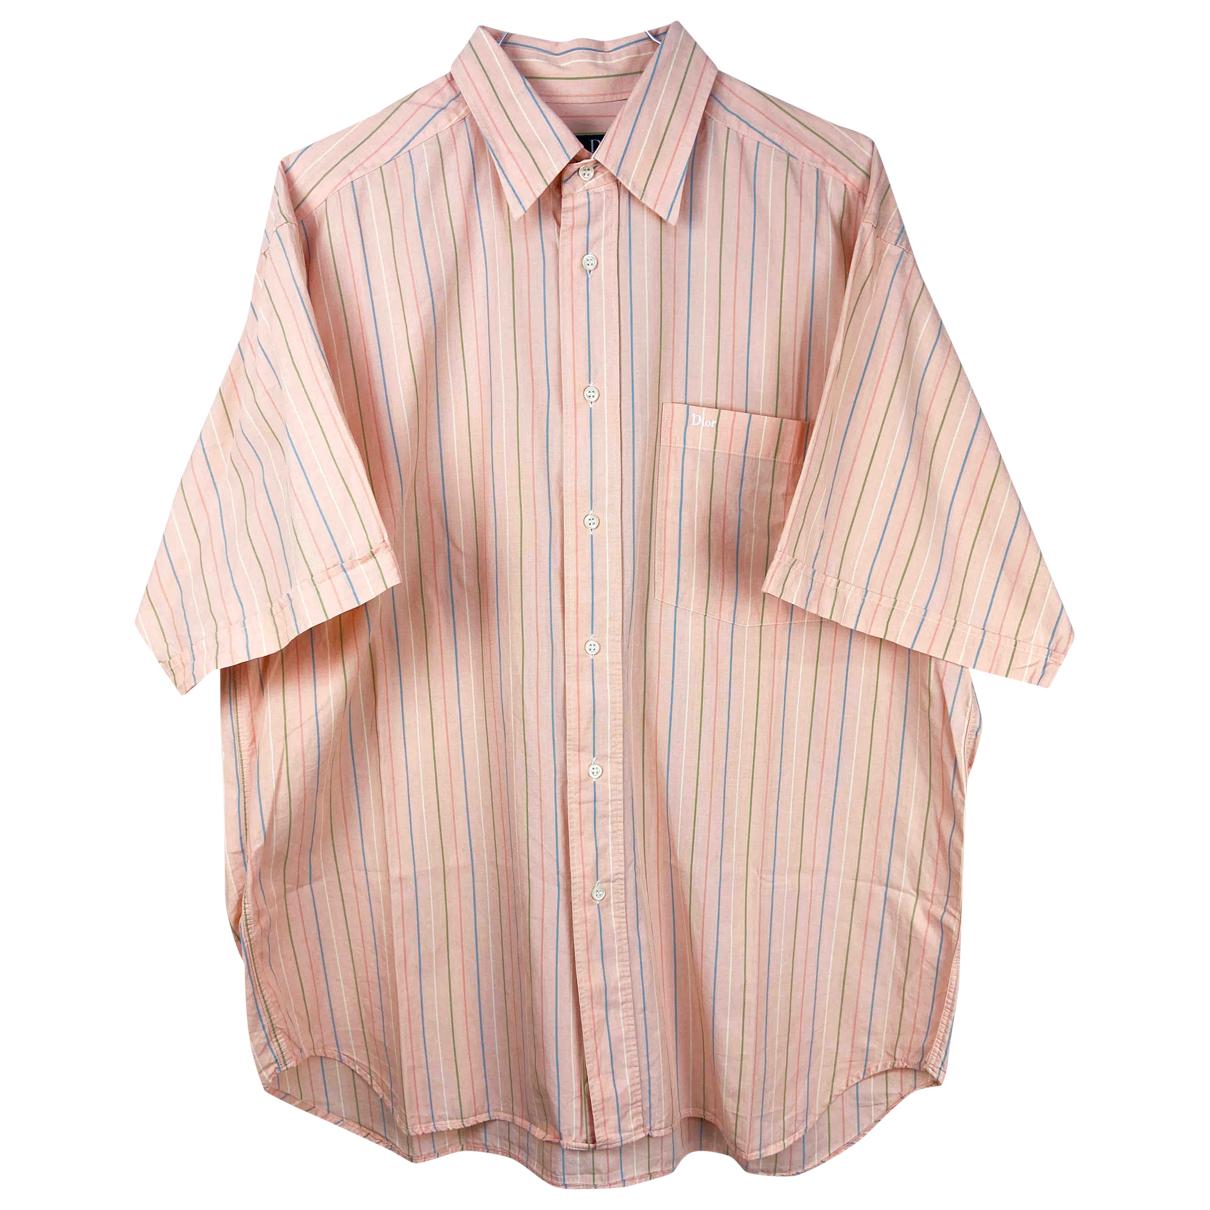 Dior Homme \N Pink Cotton Shirts for Men M International